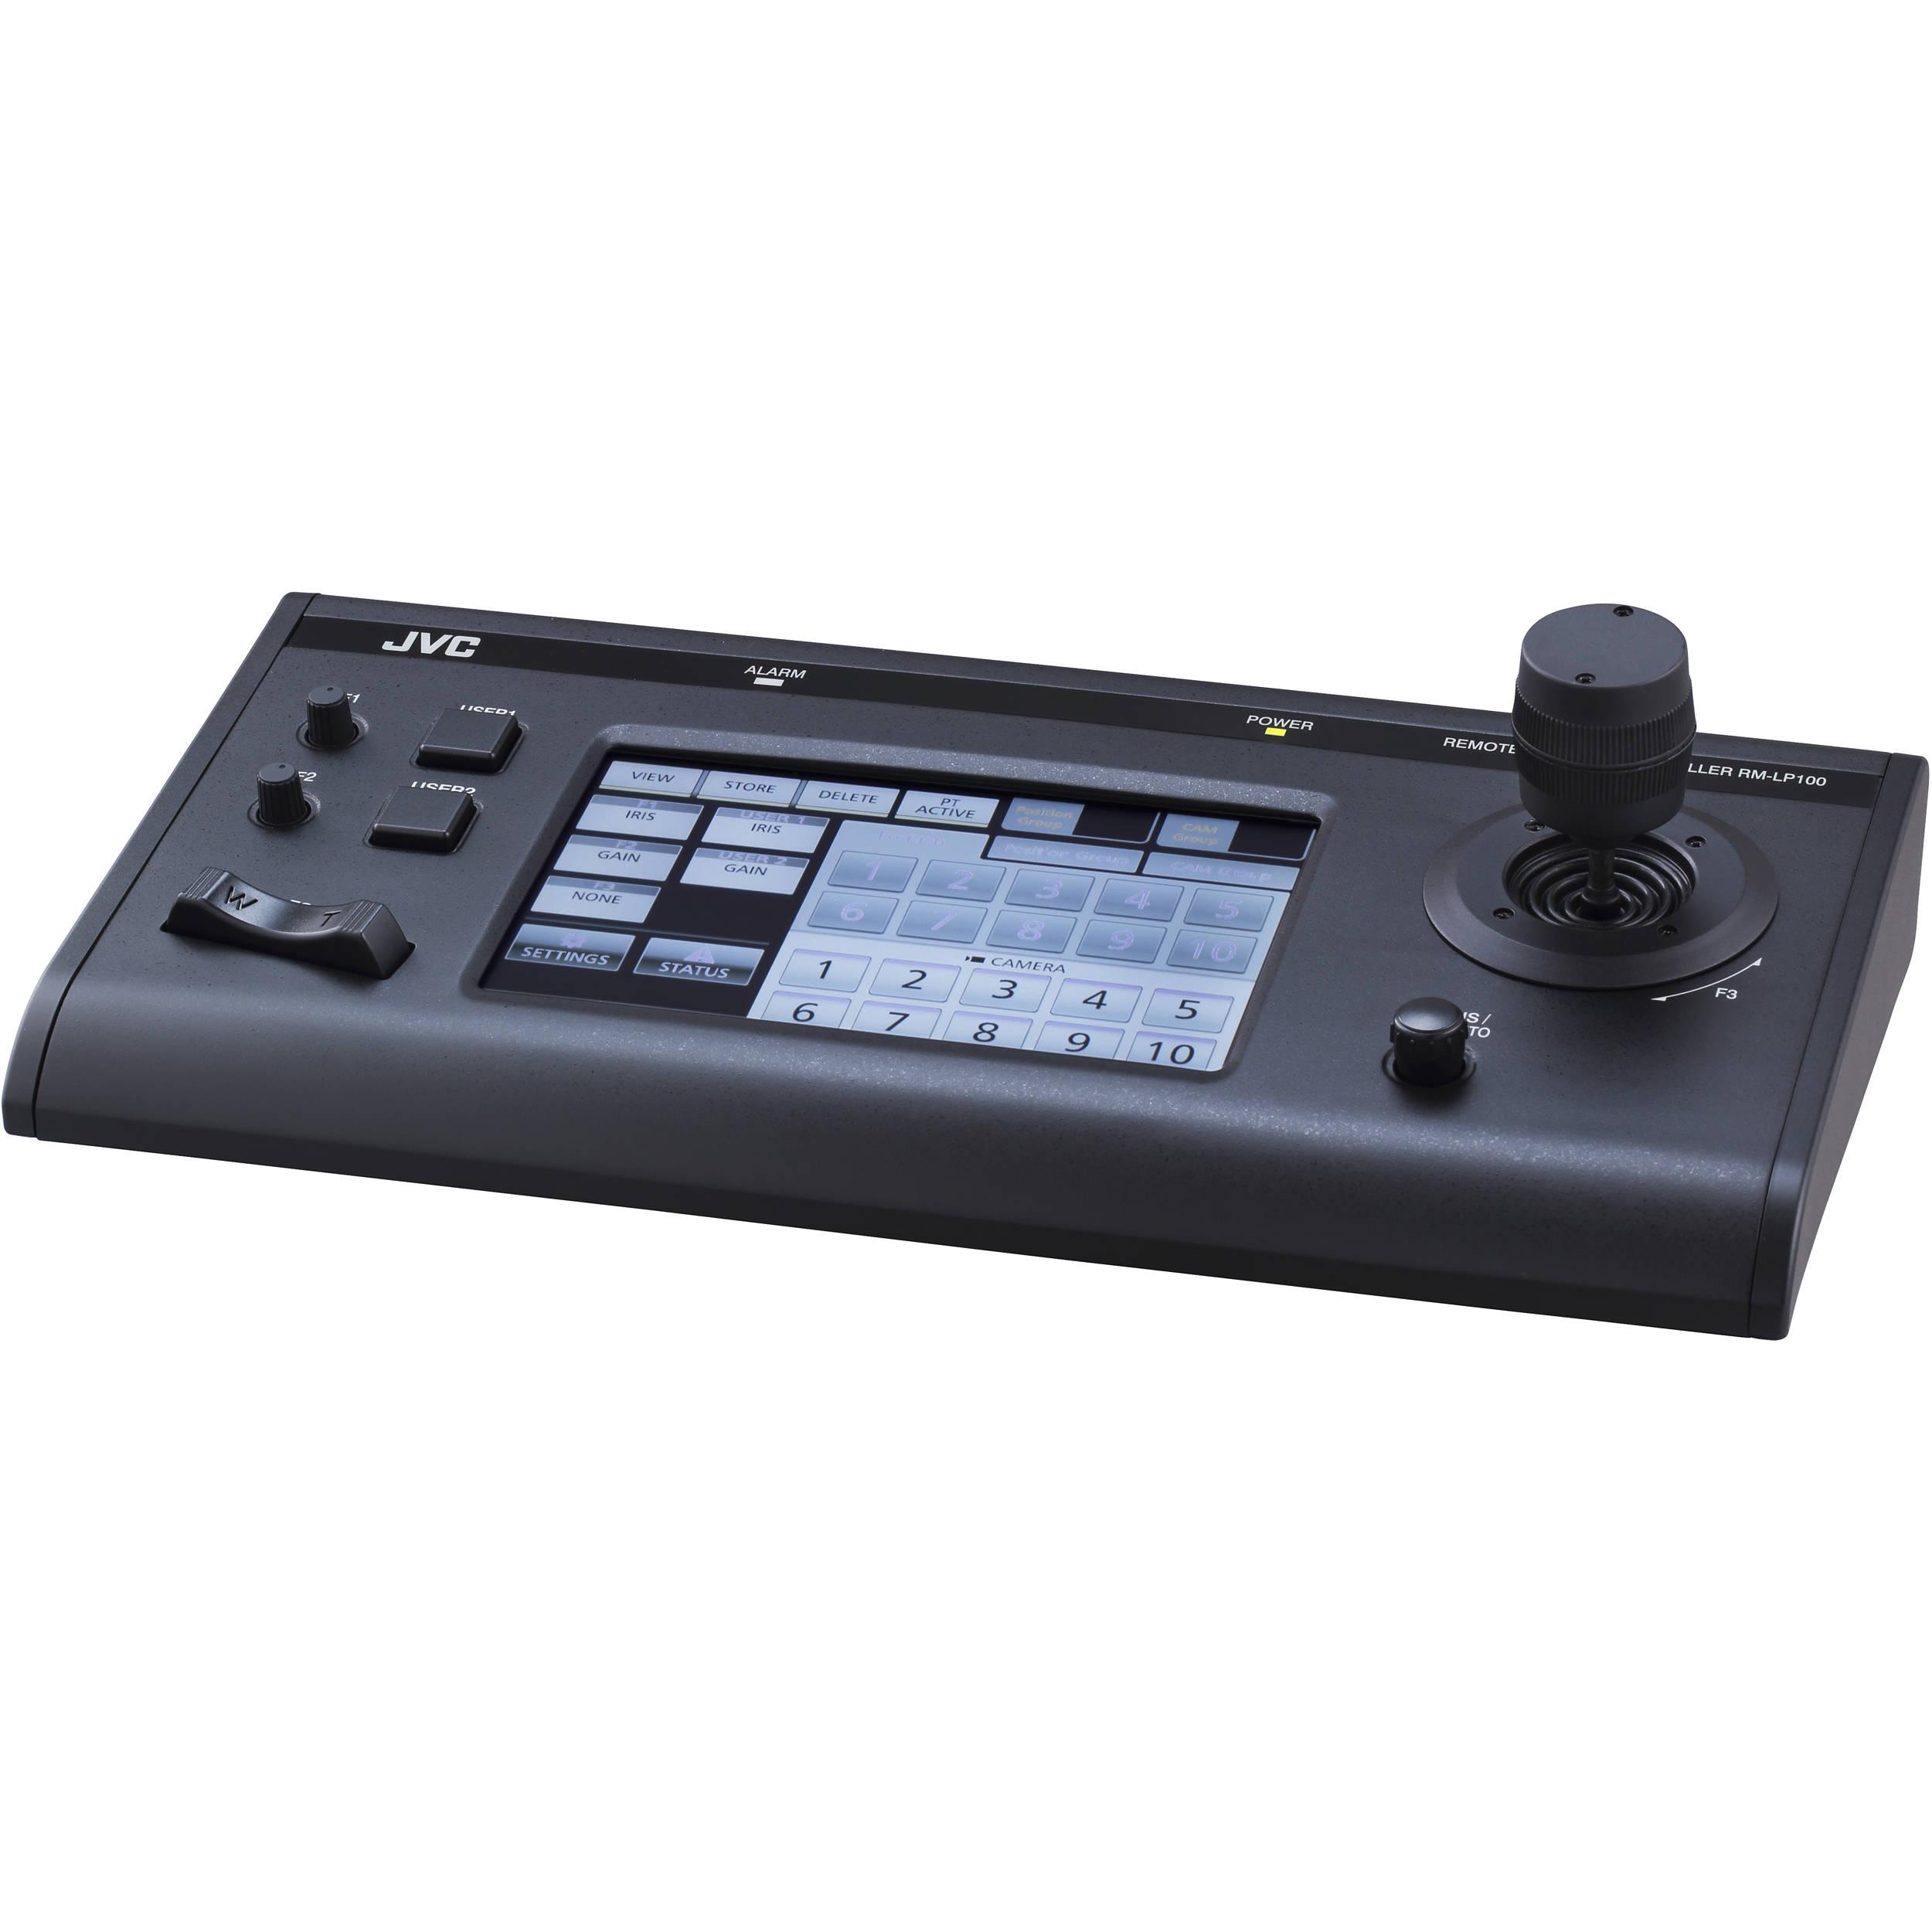 JVC Professional PTZ Remote Ca